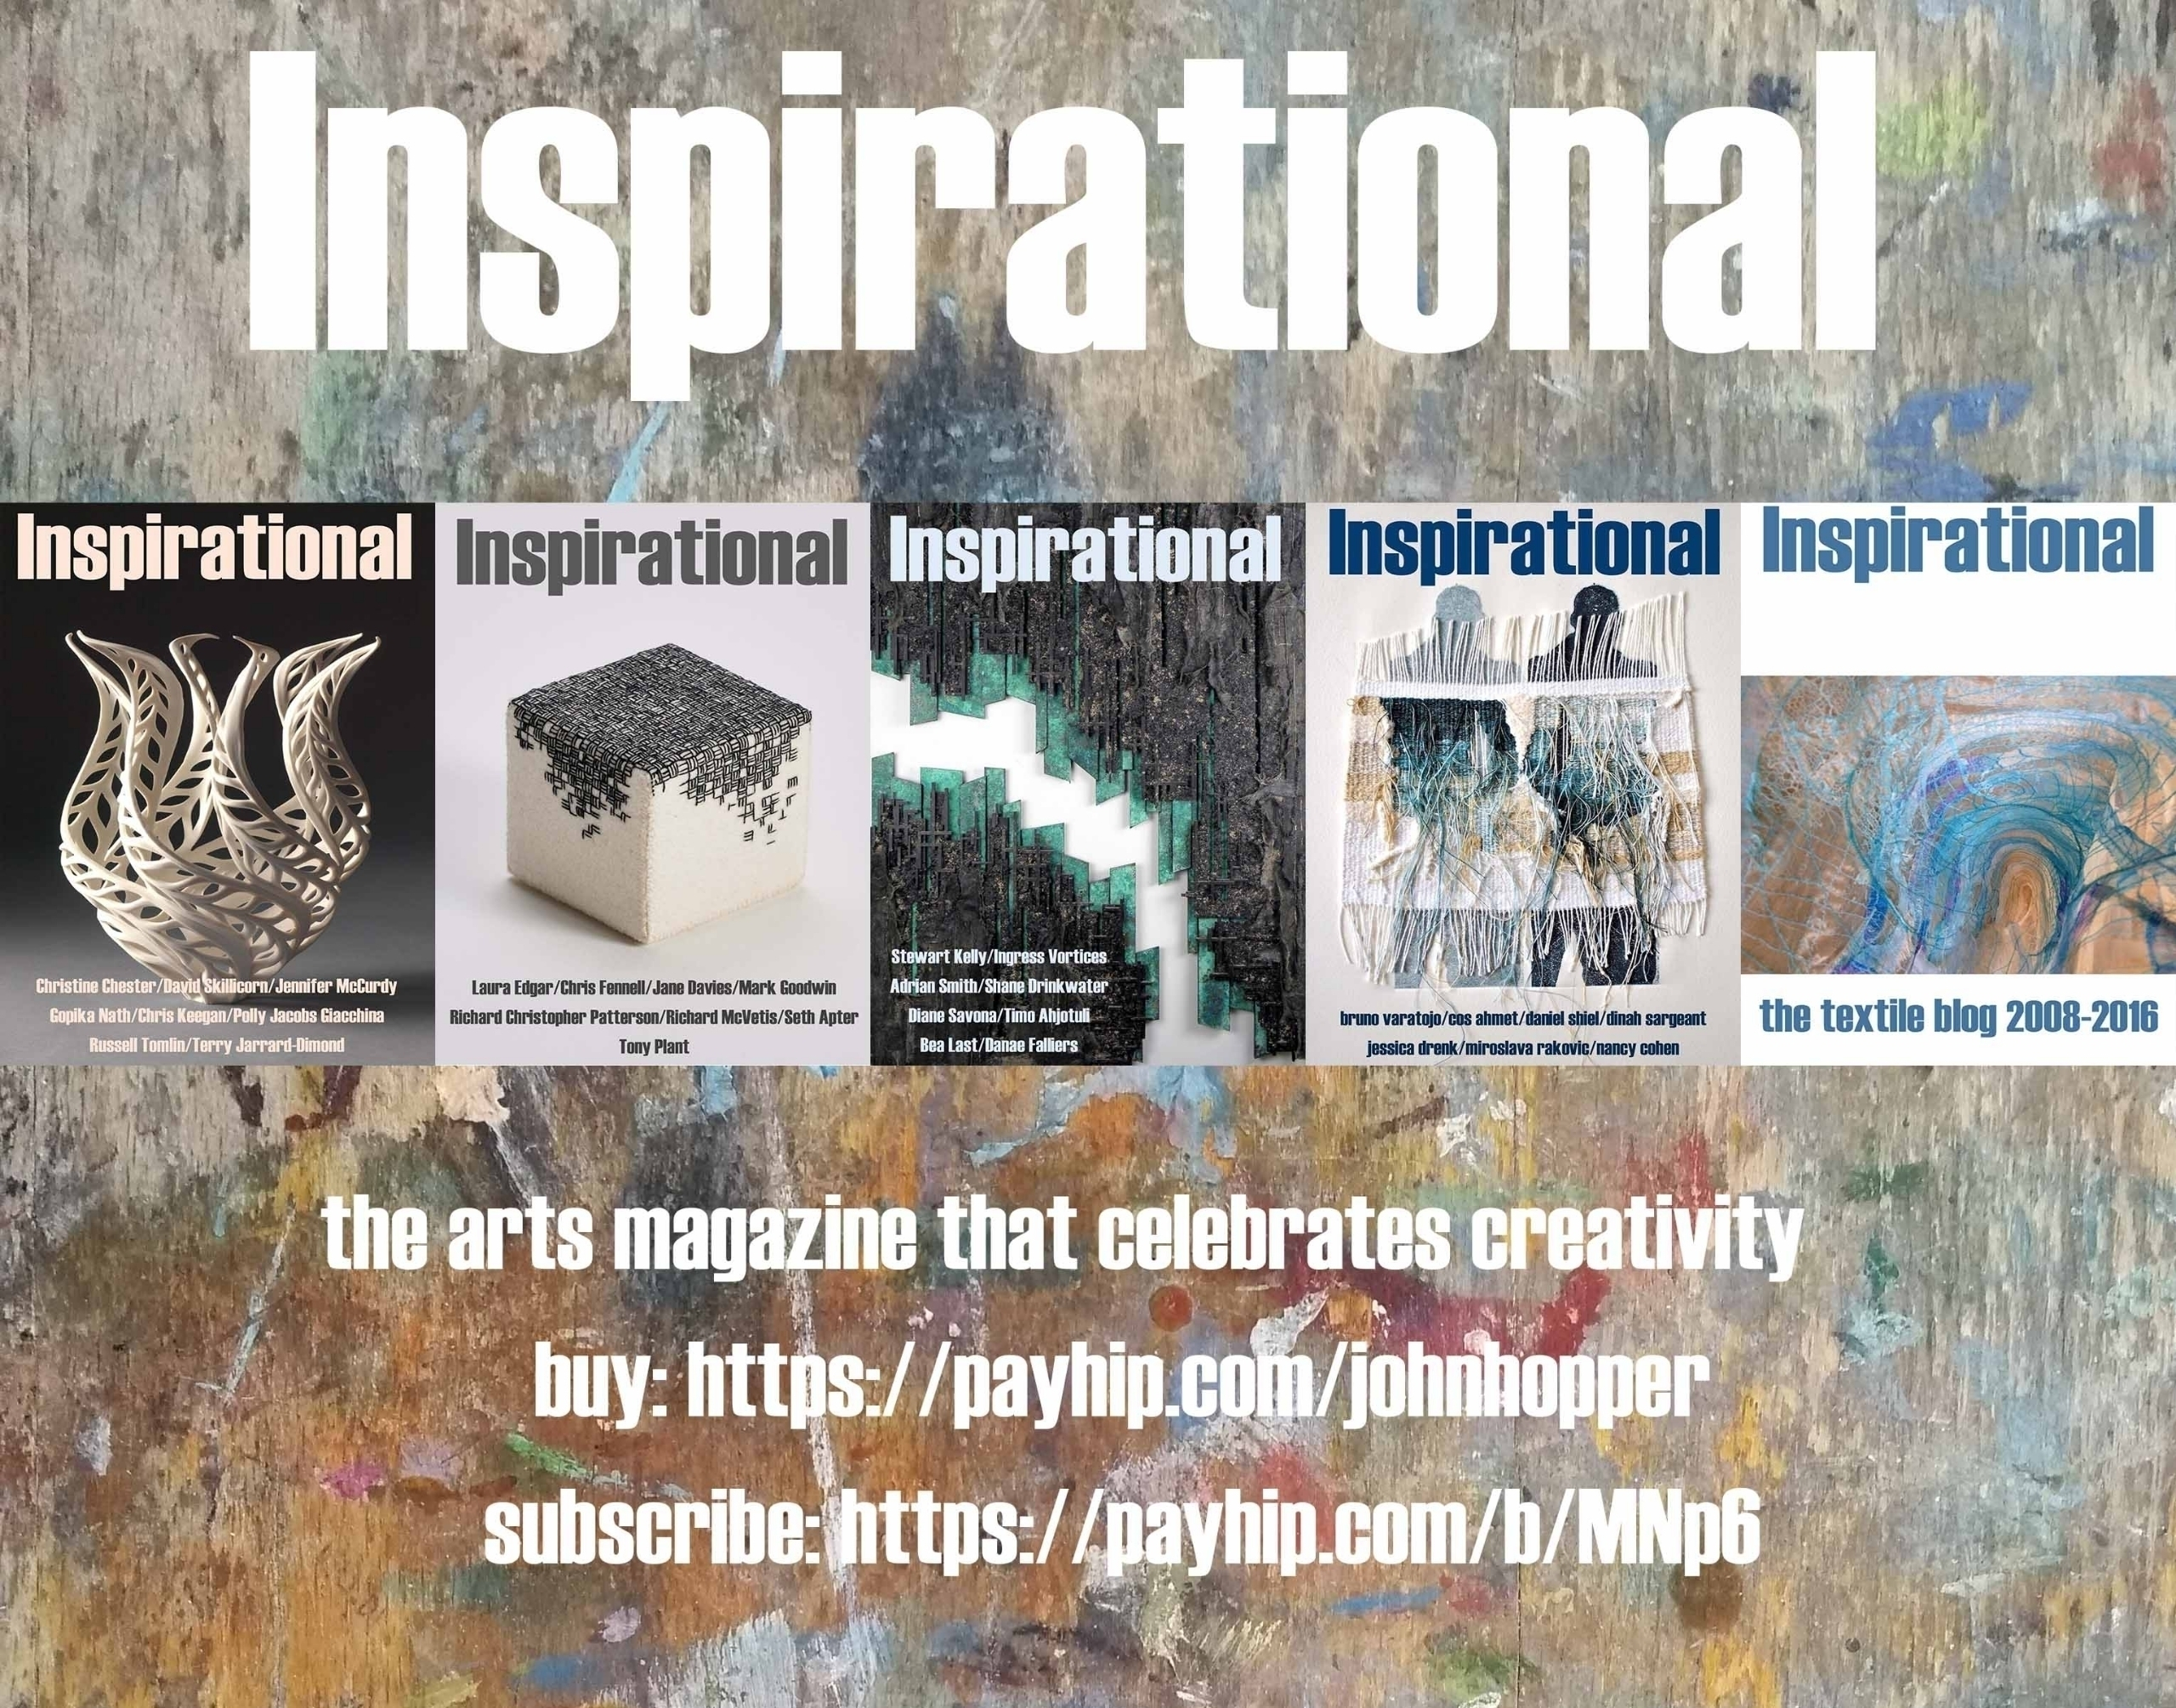 INSPIRATIONAL issues digital co - johnhopper | ello